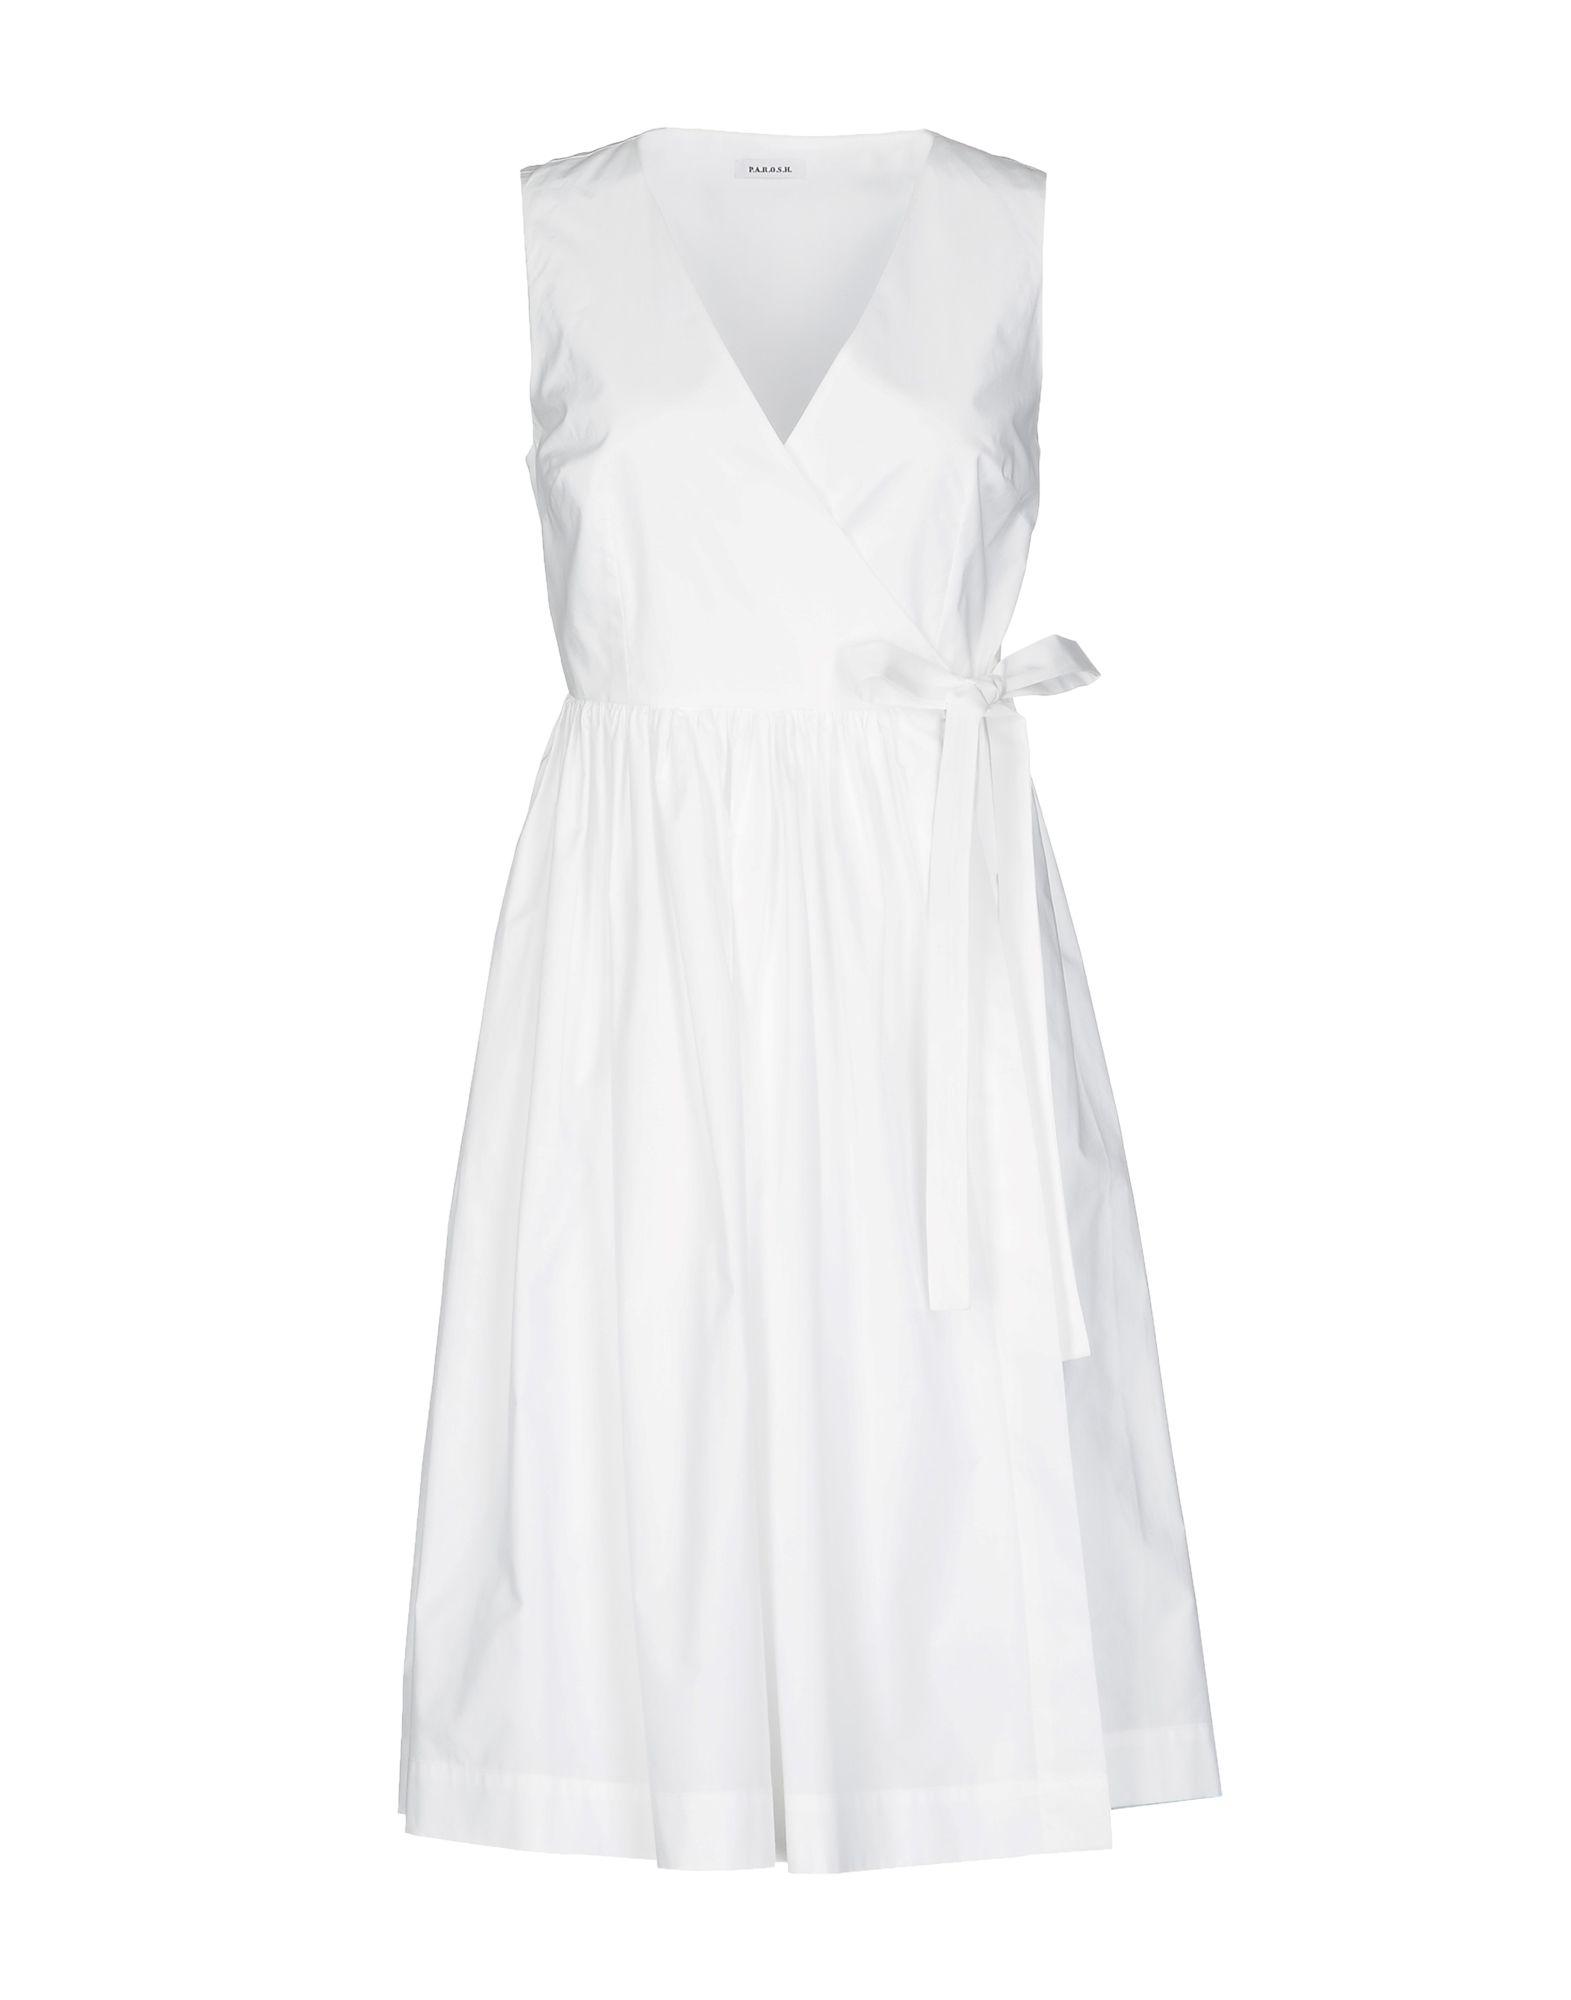 P.A.R.O.S.H. | P.A.R.O.S.H. Knee-length dresses 34798032 | Goxip